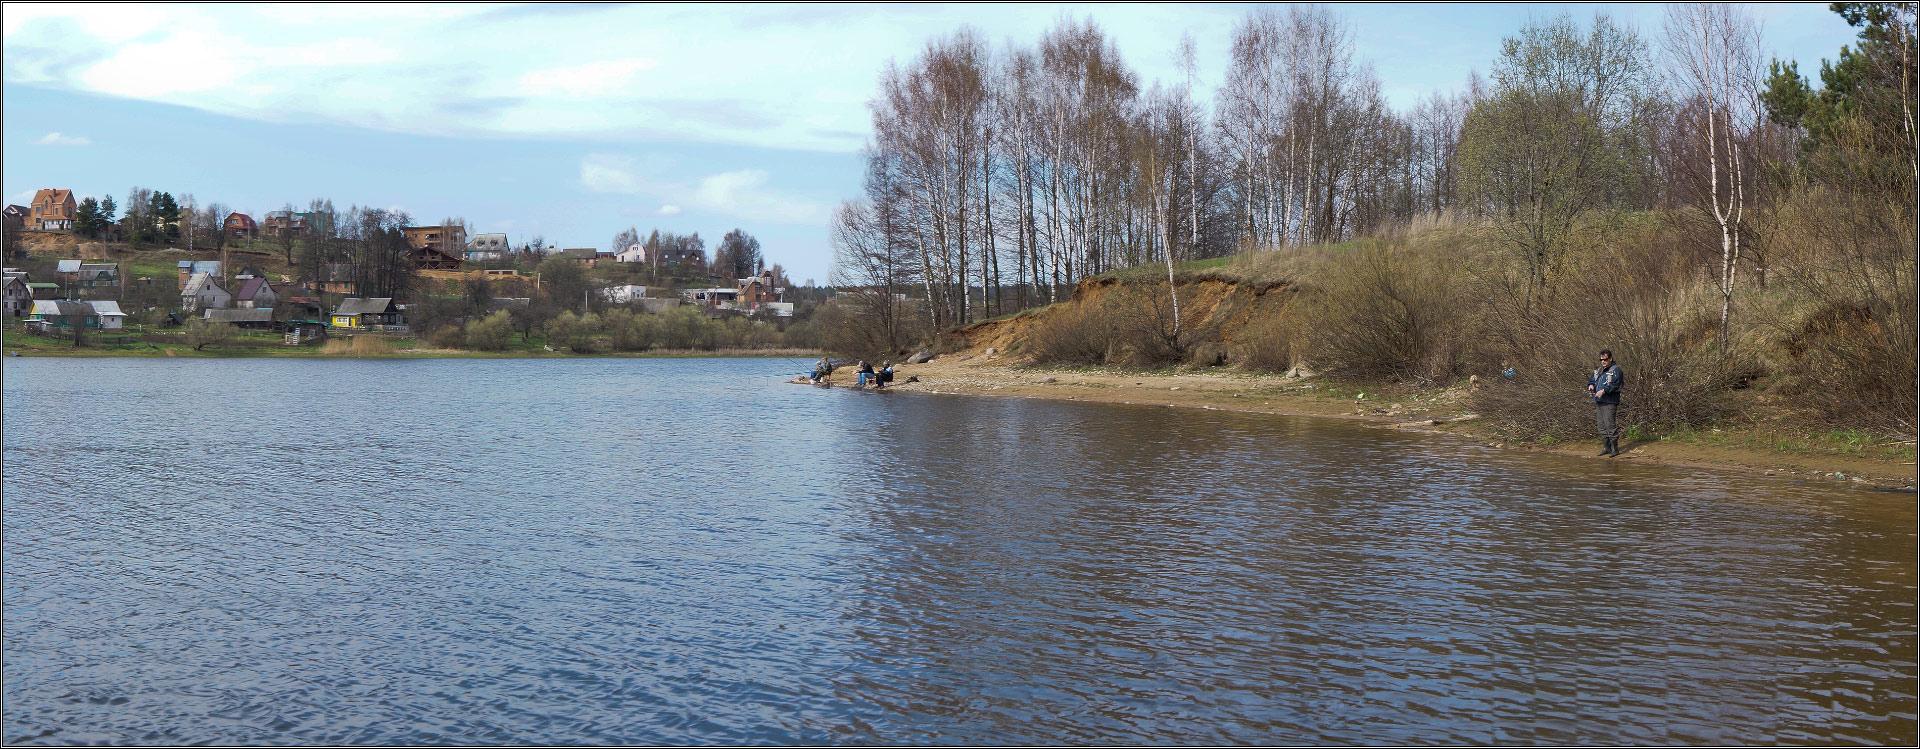 http://i1.imageban.ru/out/2012/04/25/ecc581d2342f6a364e3fa3969dc447c1.jpg